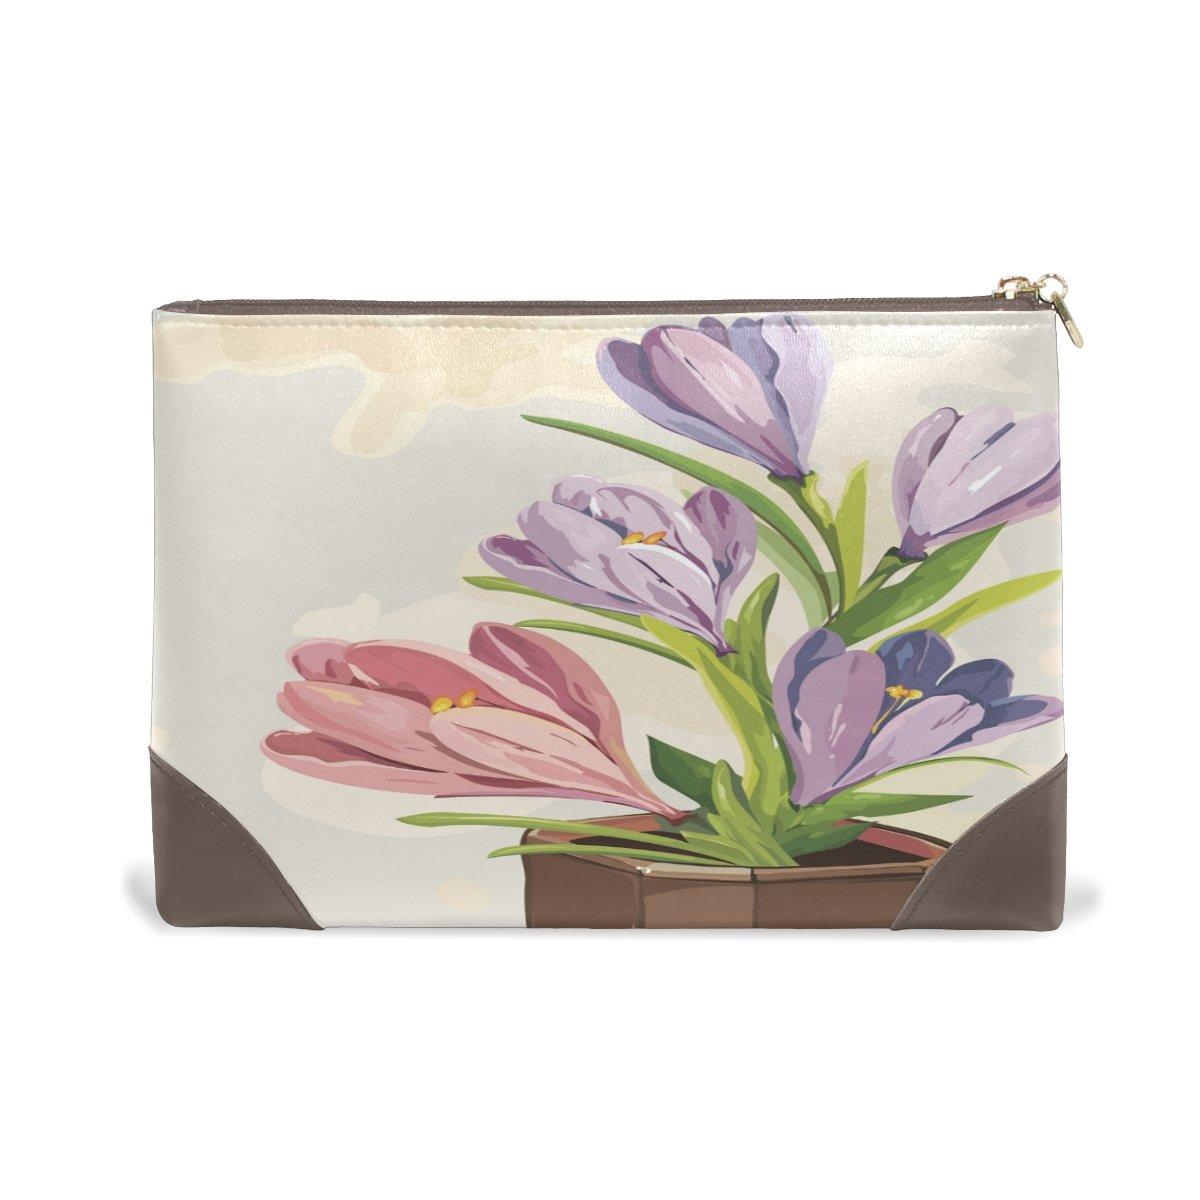 Genuine Leather Makeup Bag Flower With Comestic Case Ladies Max 84% OFF Sale Zipp